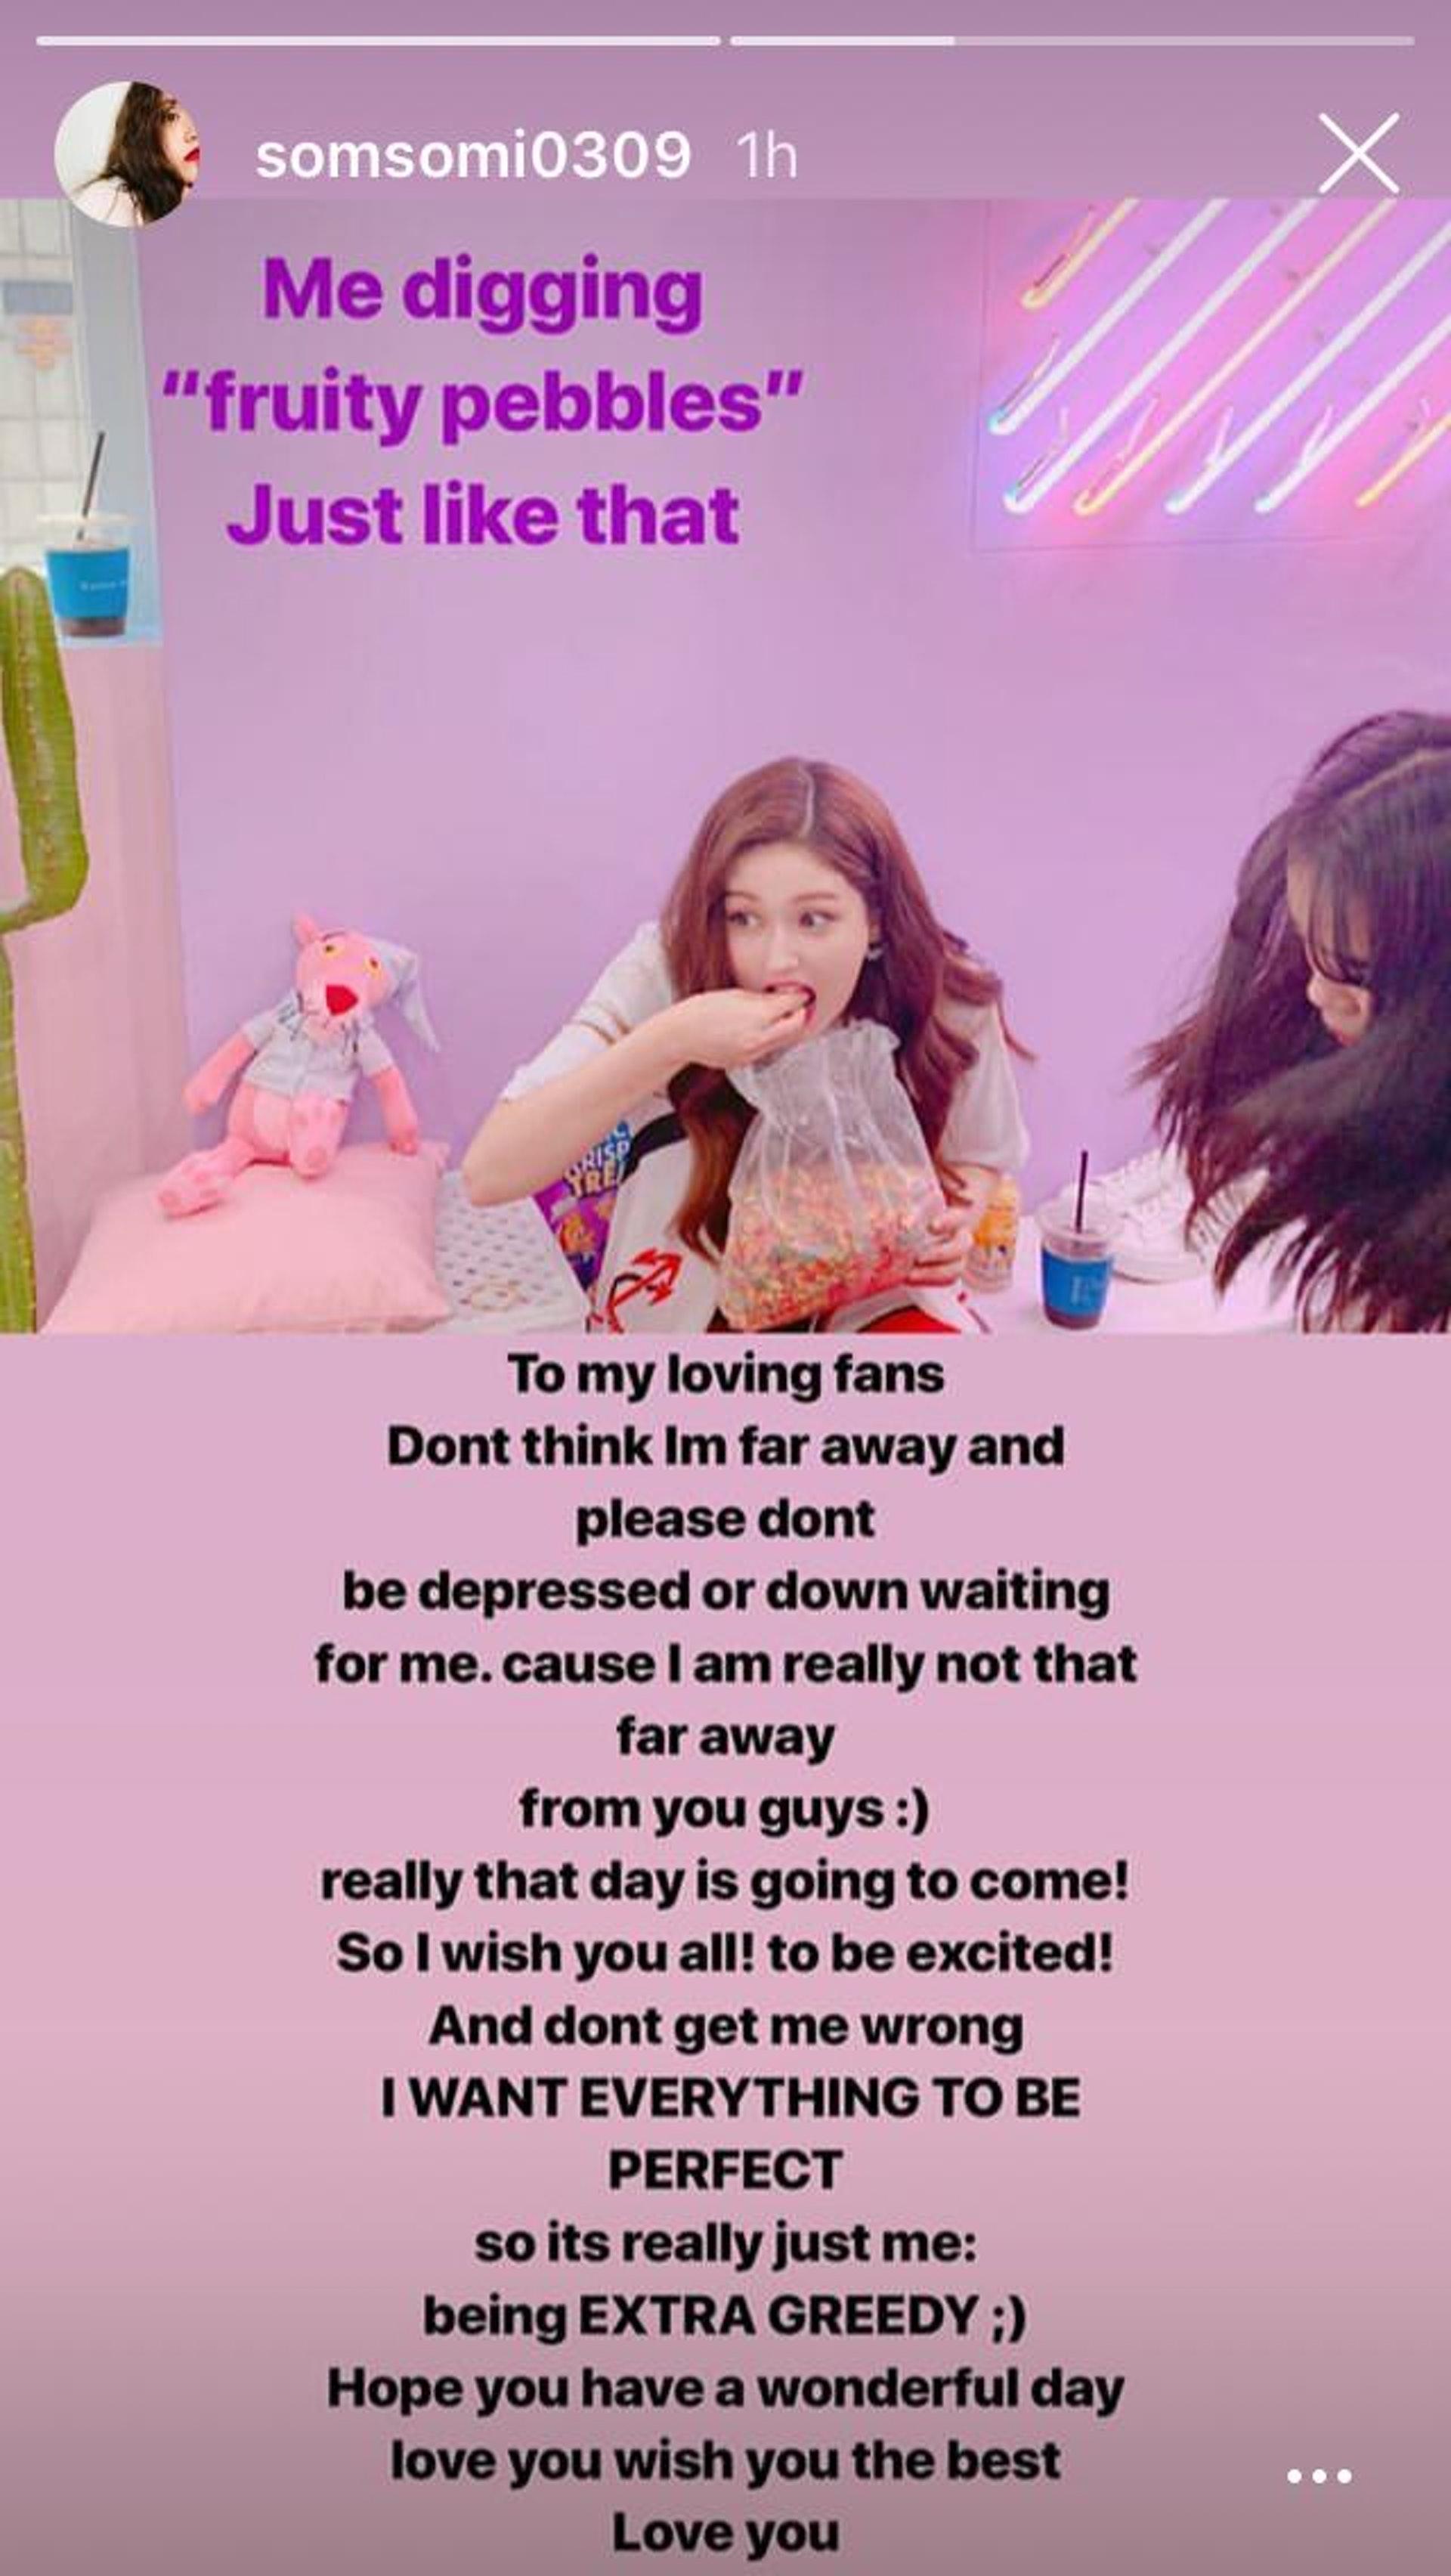 Somi今早發文安慰粉絲,可是她已把限時動態刪除。(網上圖片)